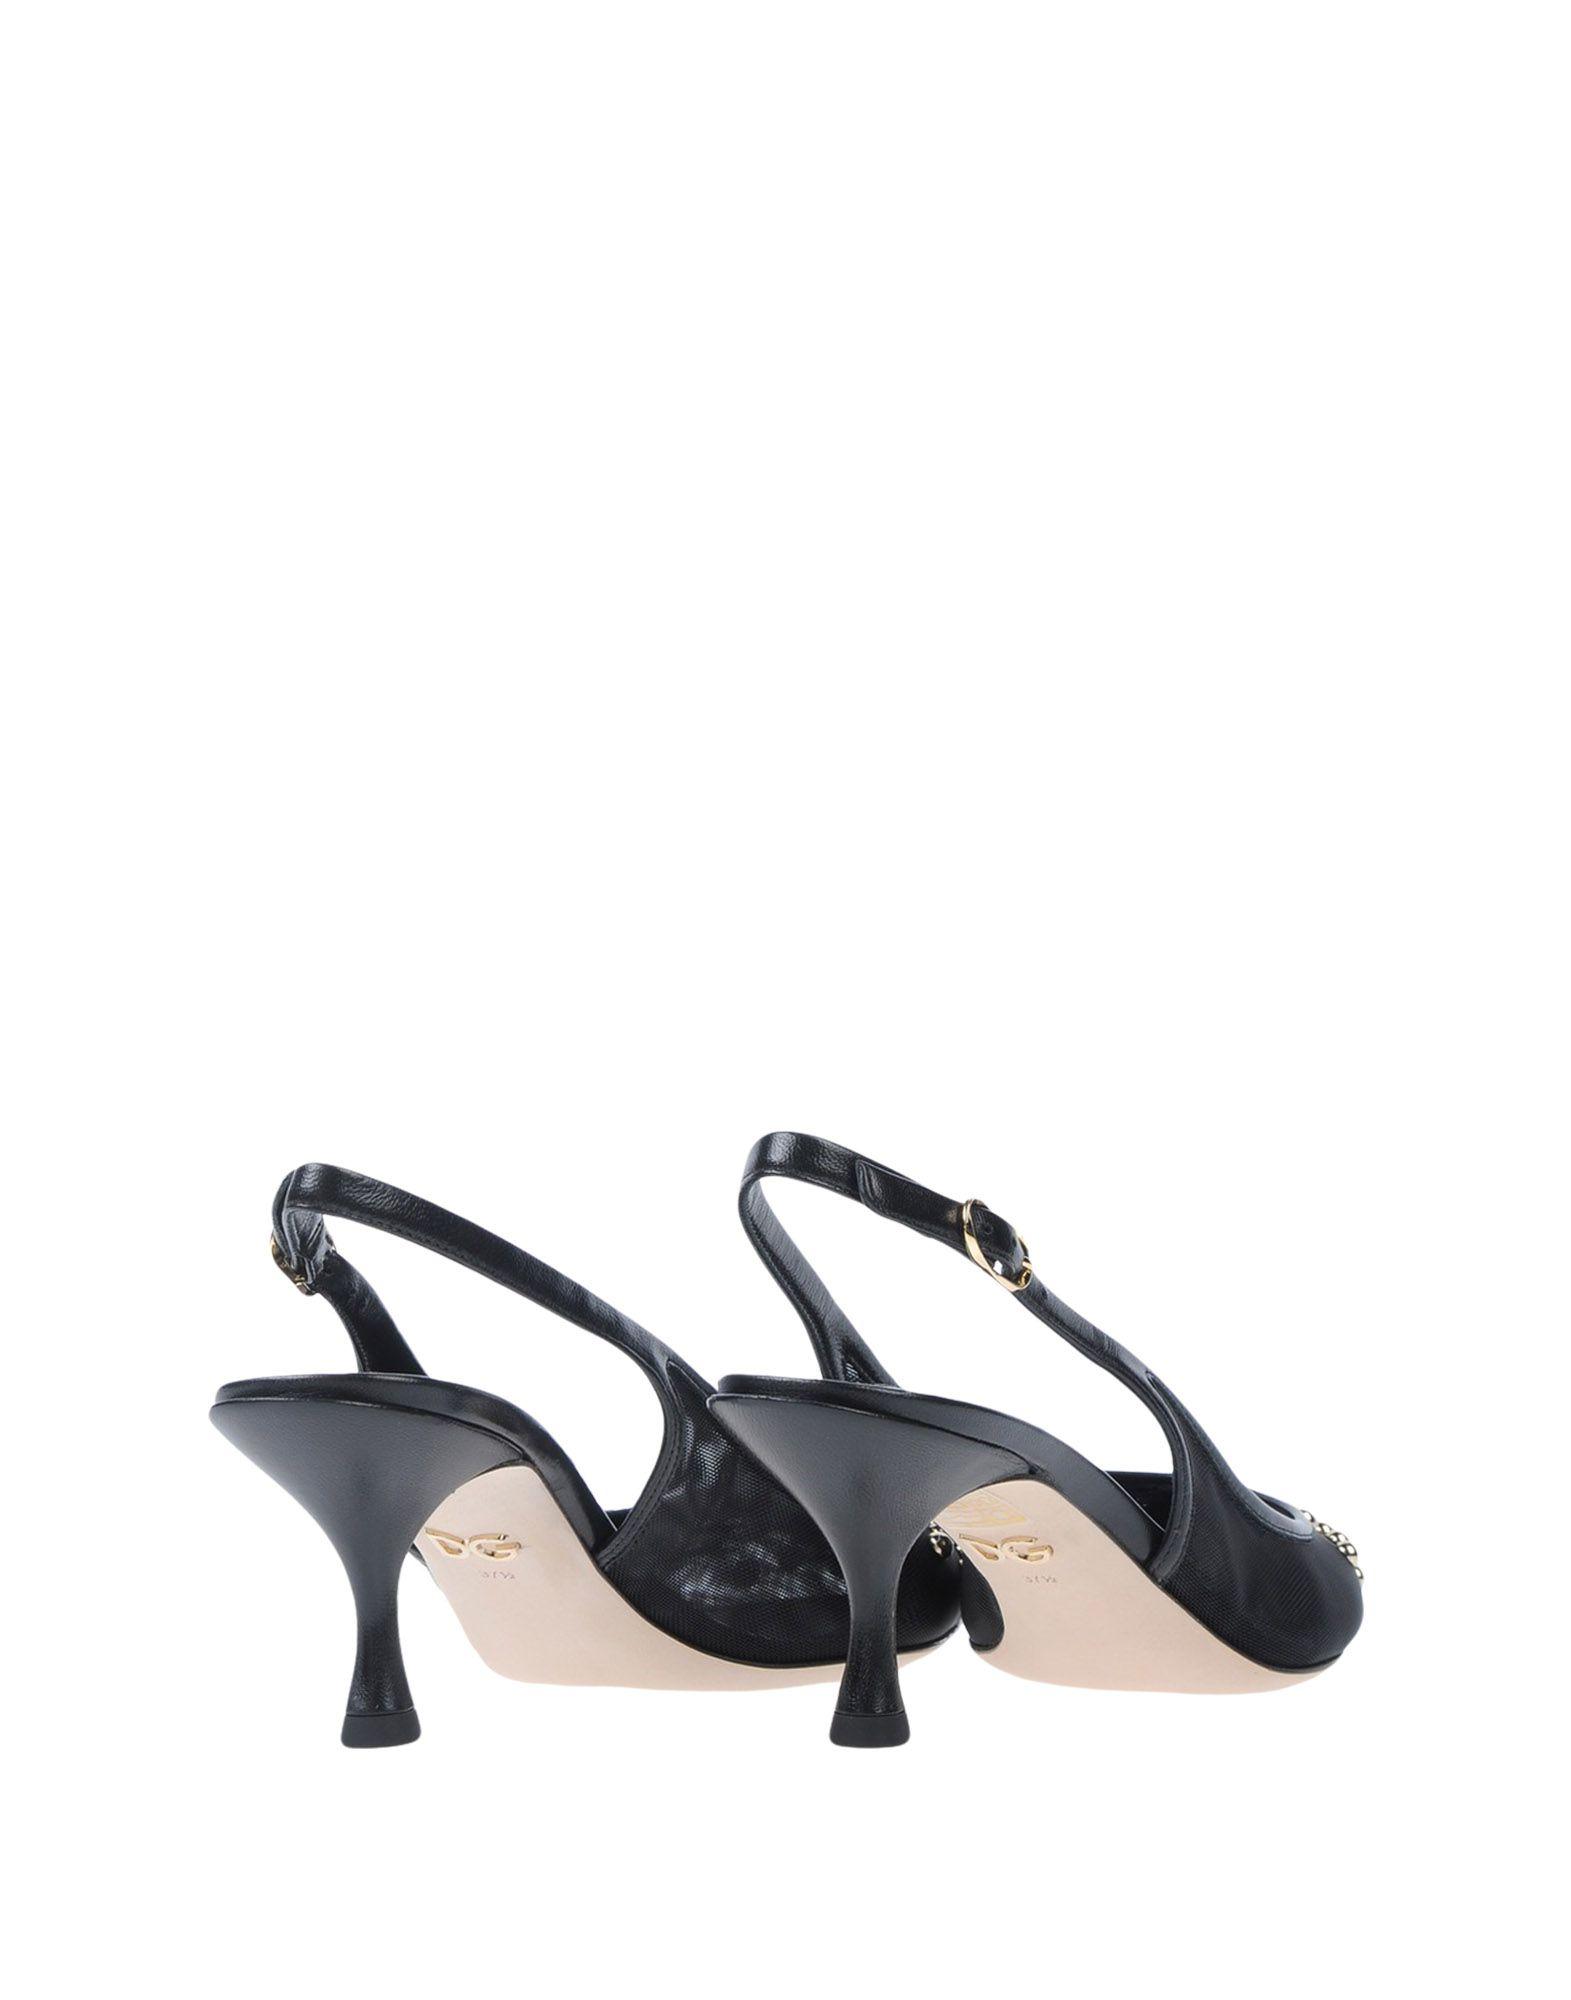 Dolce & Gabbana Pumps Damen Schuhe  11508169MF Neue Schuhe Damen f29646